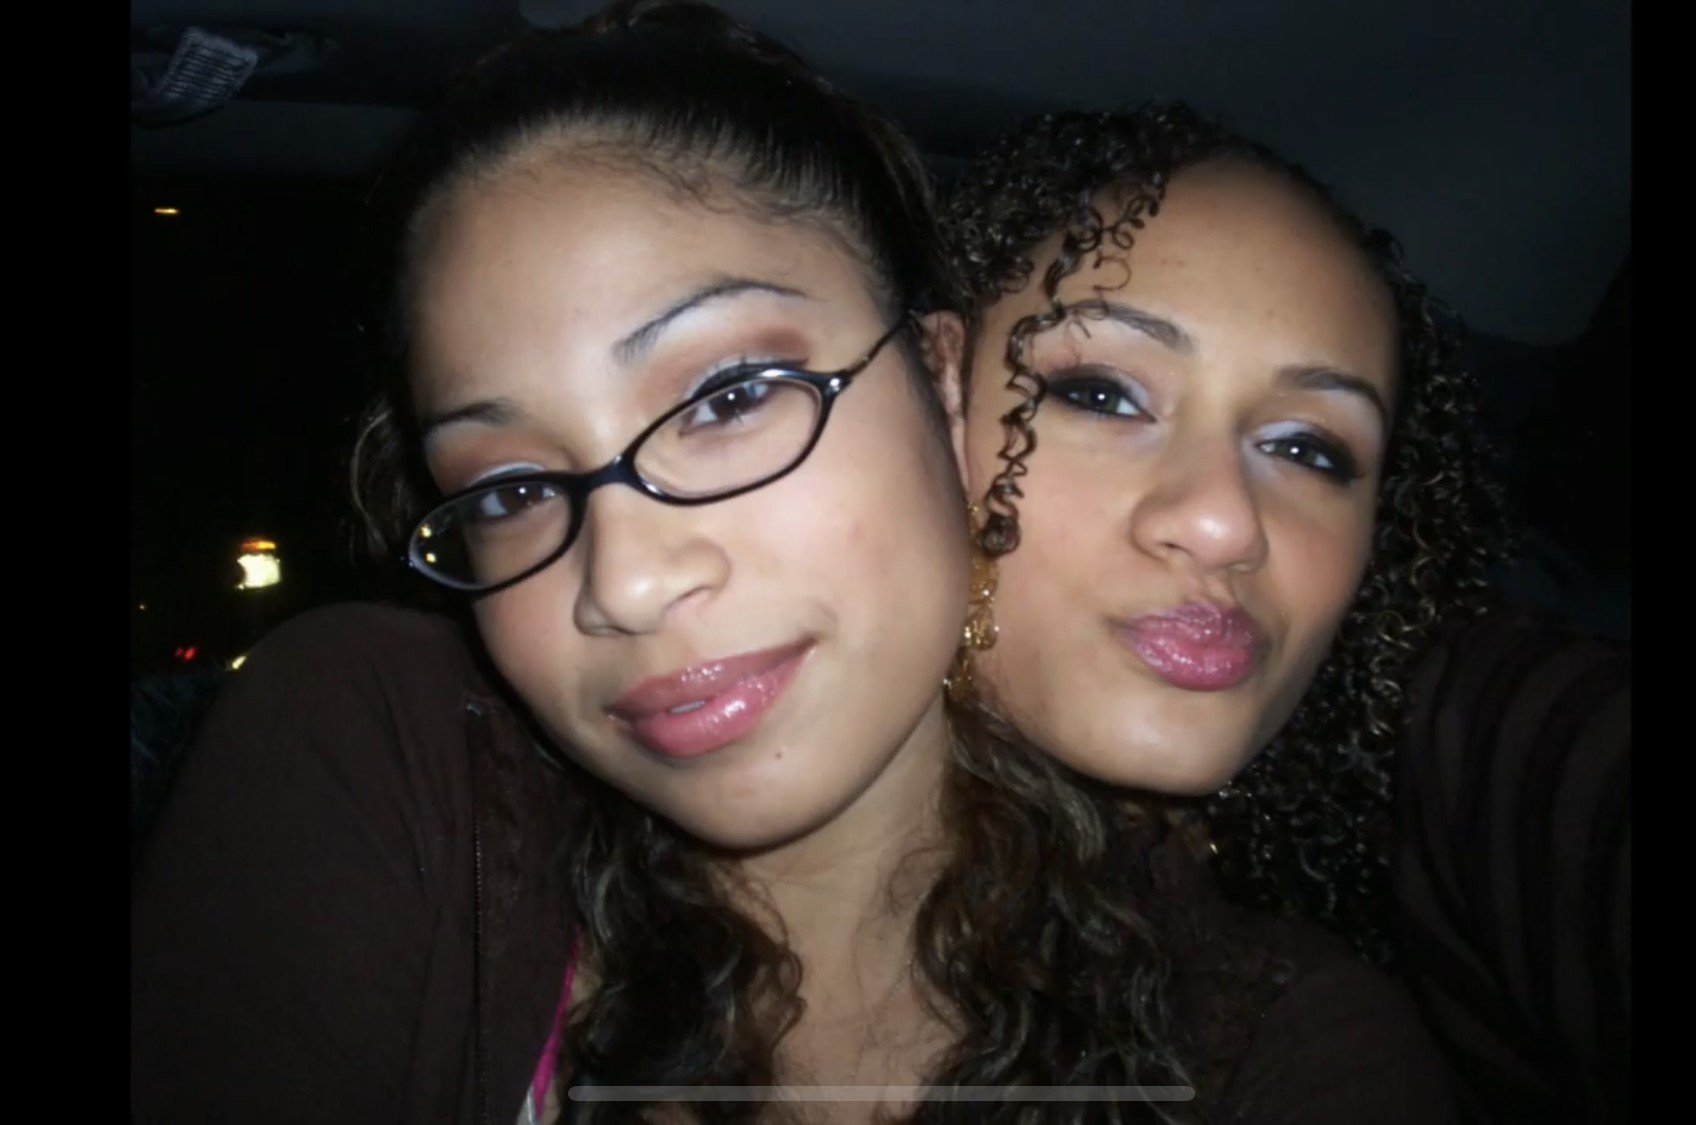 Jacqueline and Sandi